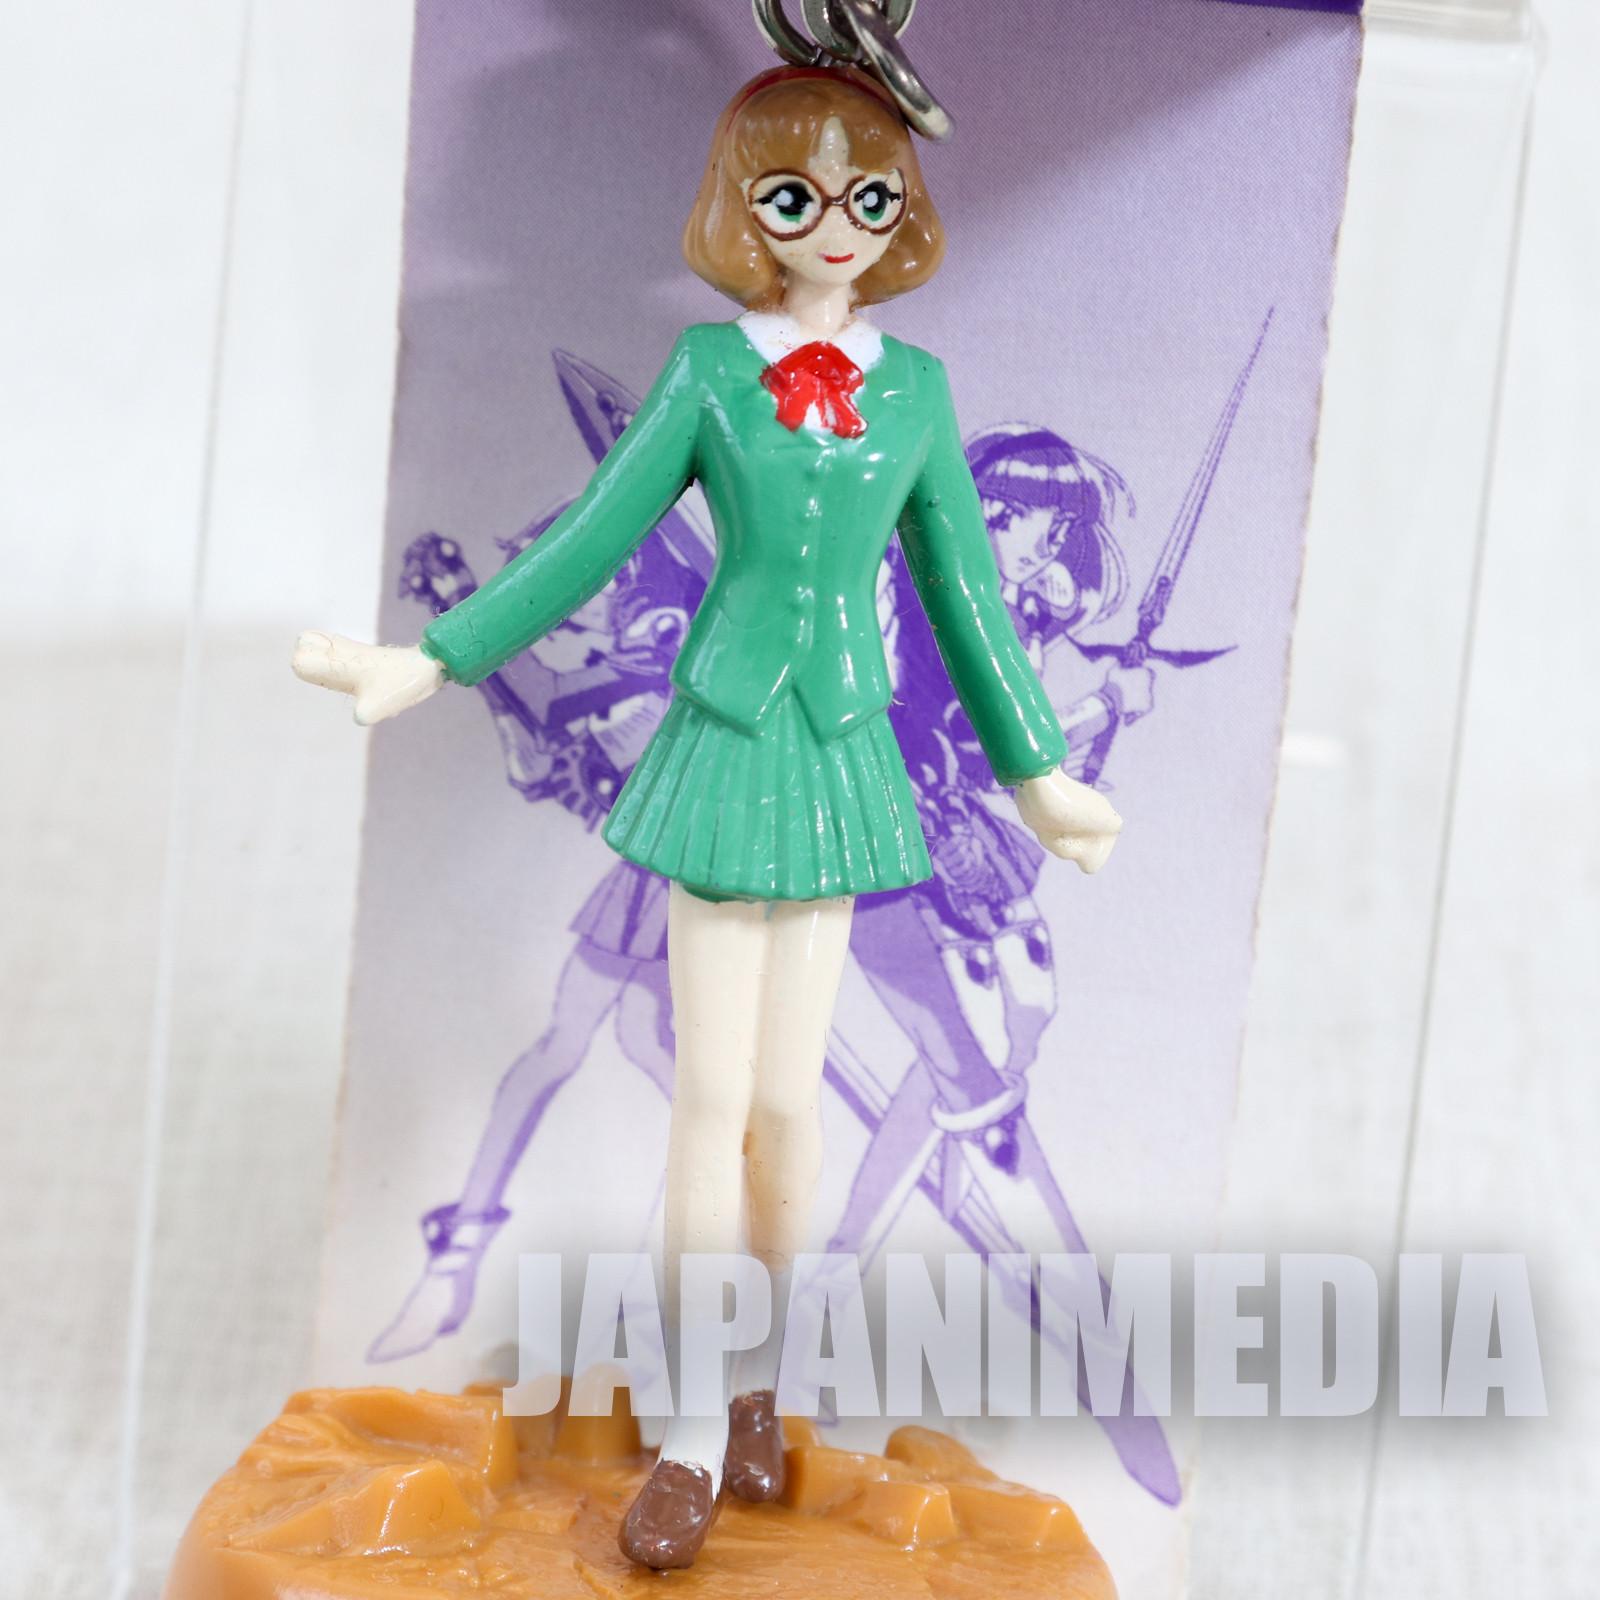 Magic Knight Rayearth Fuu Hououji Figure Keychain SEGA CLAMP JAPAN ANIME